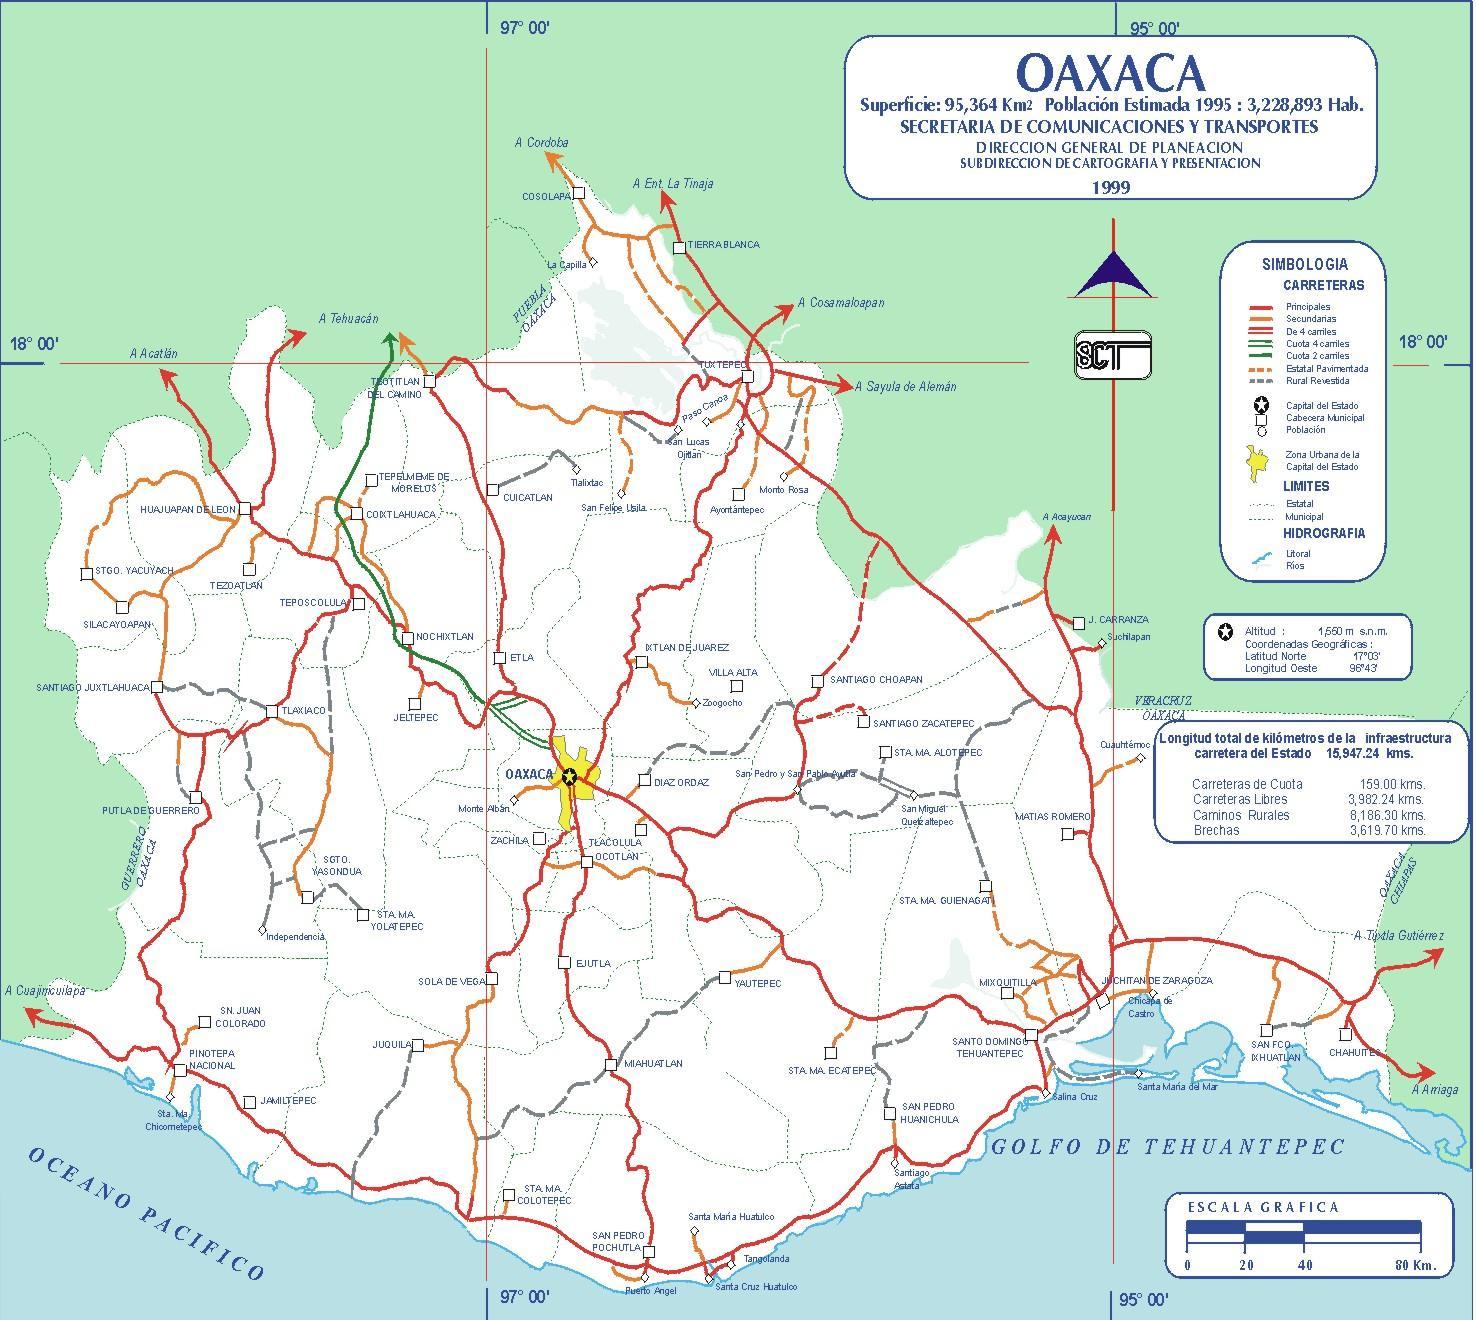 mazatlan mexico map with Mapa De Carreteras De Oaxaca 1999 on Sonorabaja Road Trip Day Three Hermosillo To Guaymas moreover Berlin in addition Chicago besides 4334204852 additionally MapaHotel.